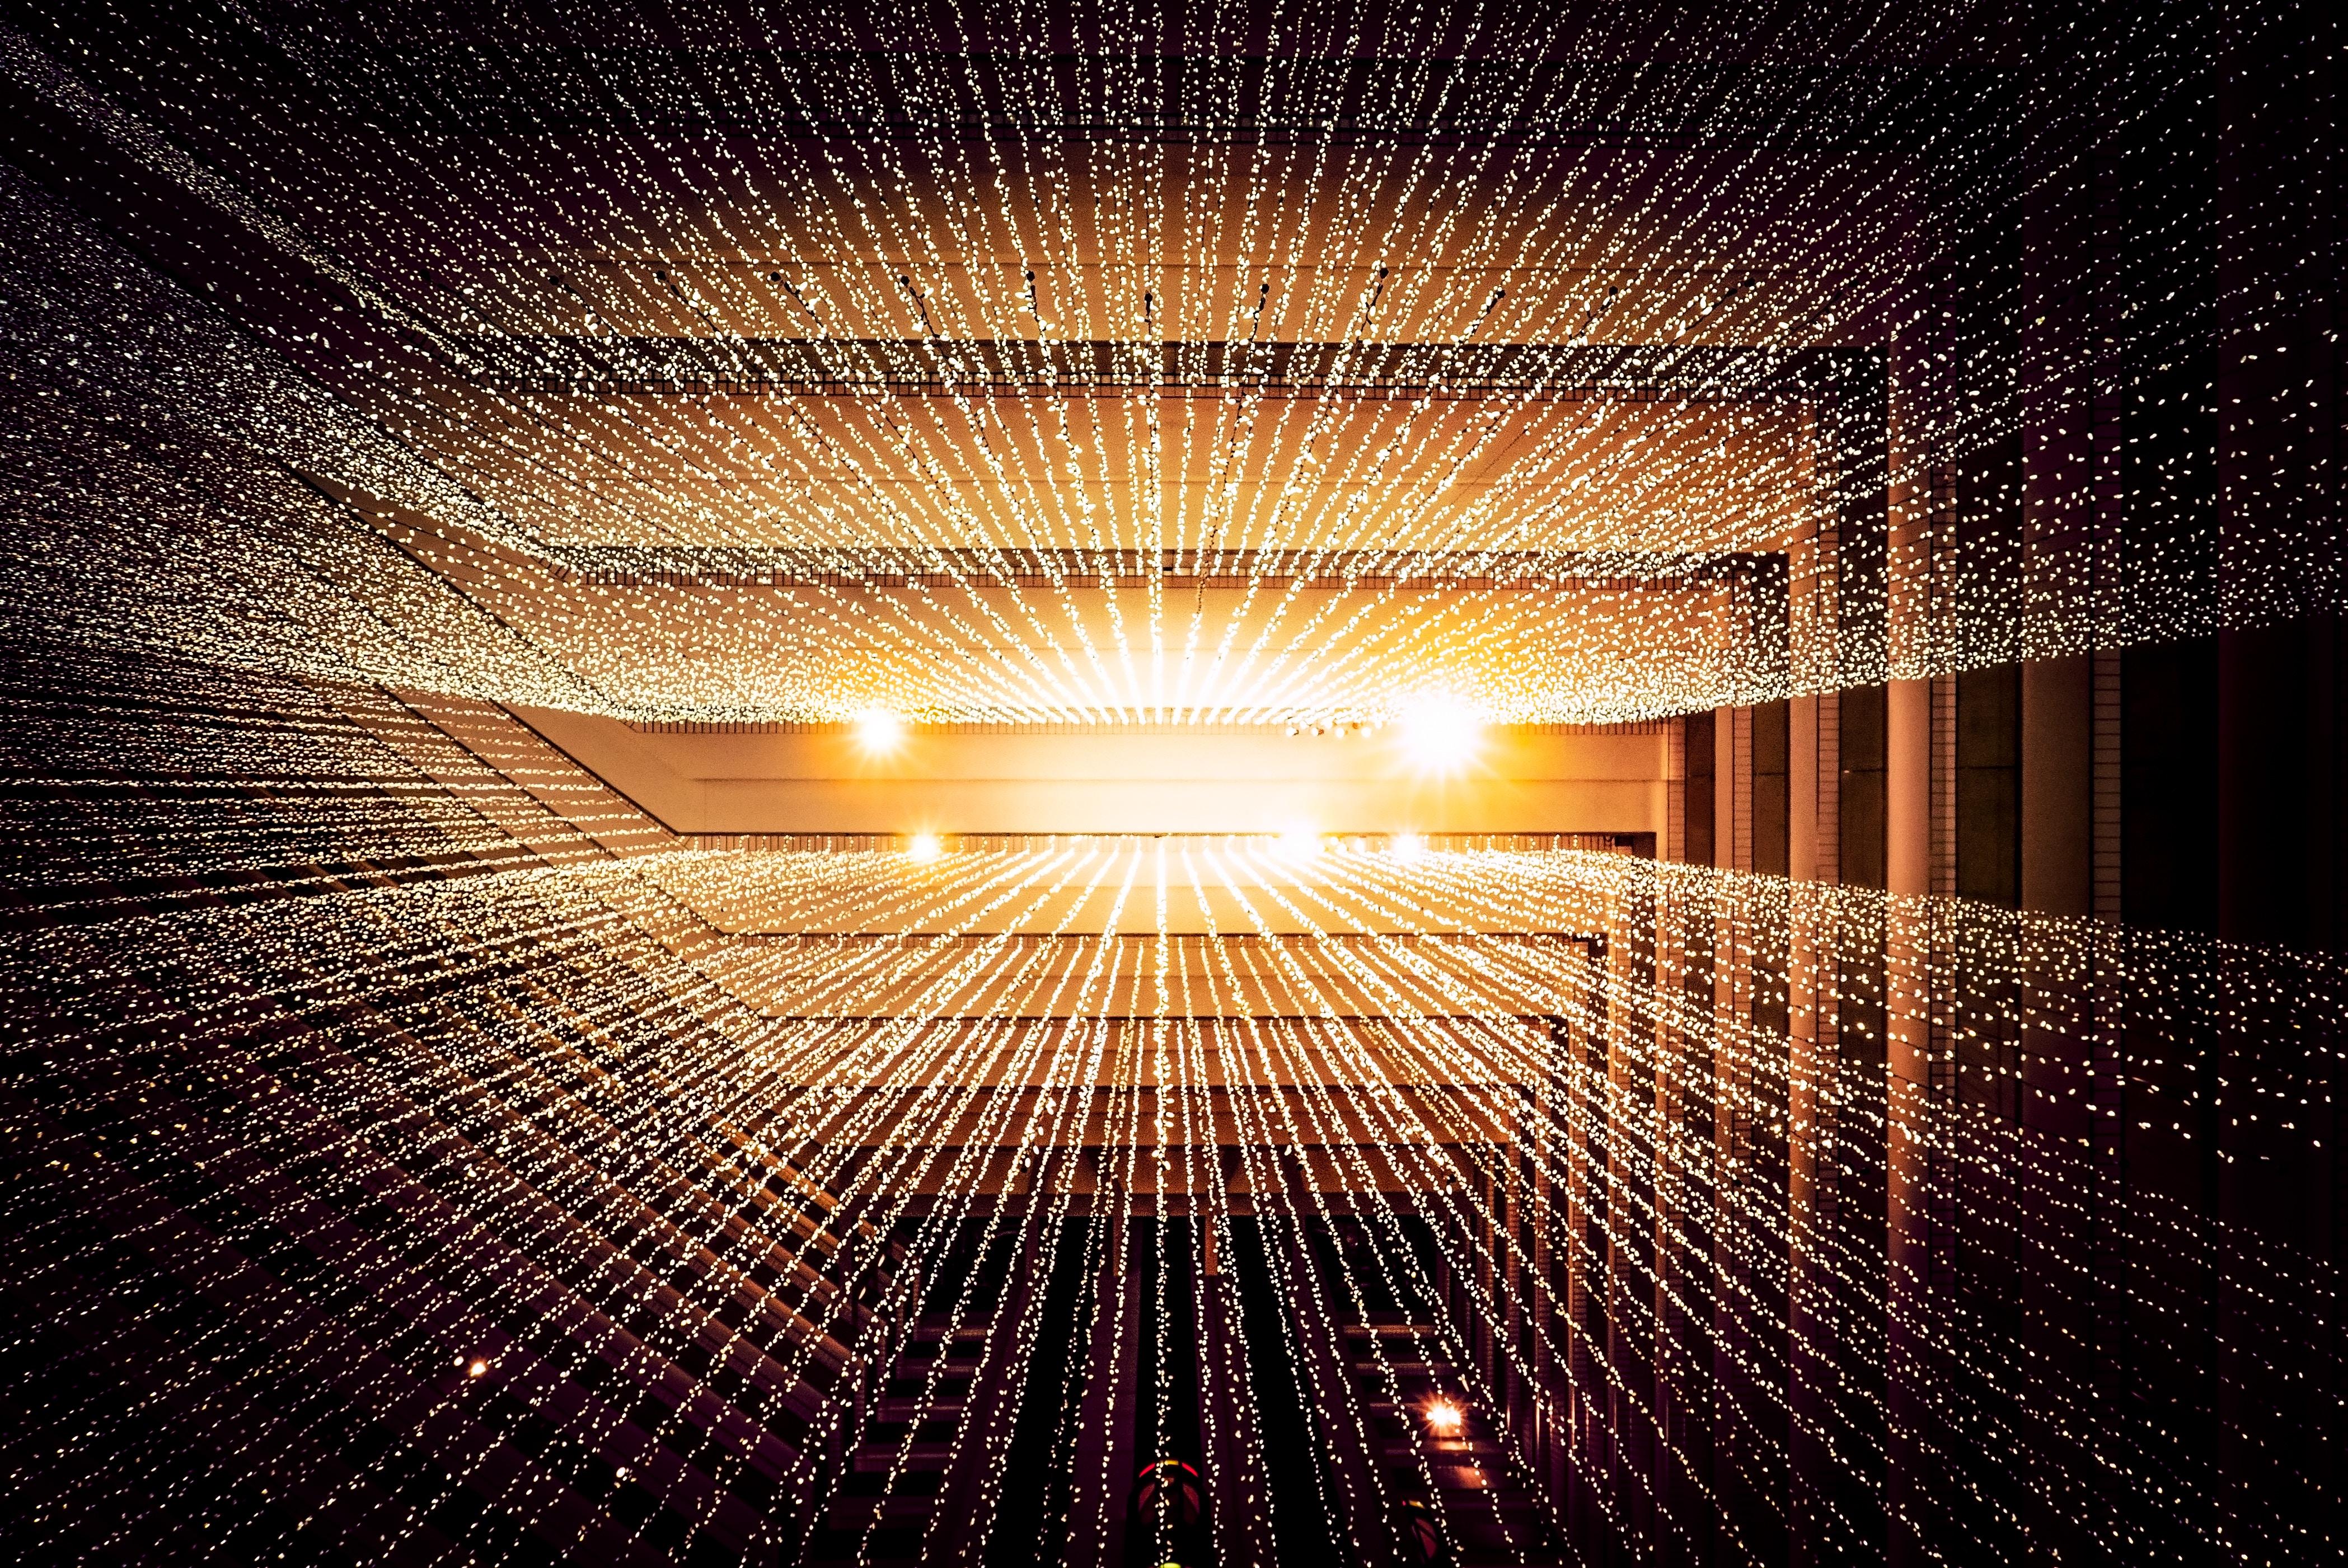 Comunicazione Diretta Sicura Quantistica: cos'è e come funziona   Agenda Digitale